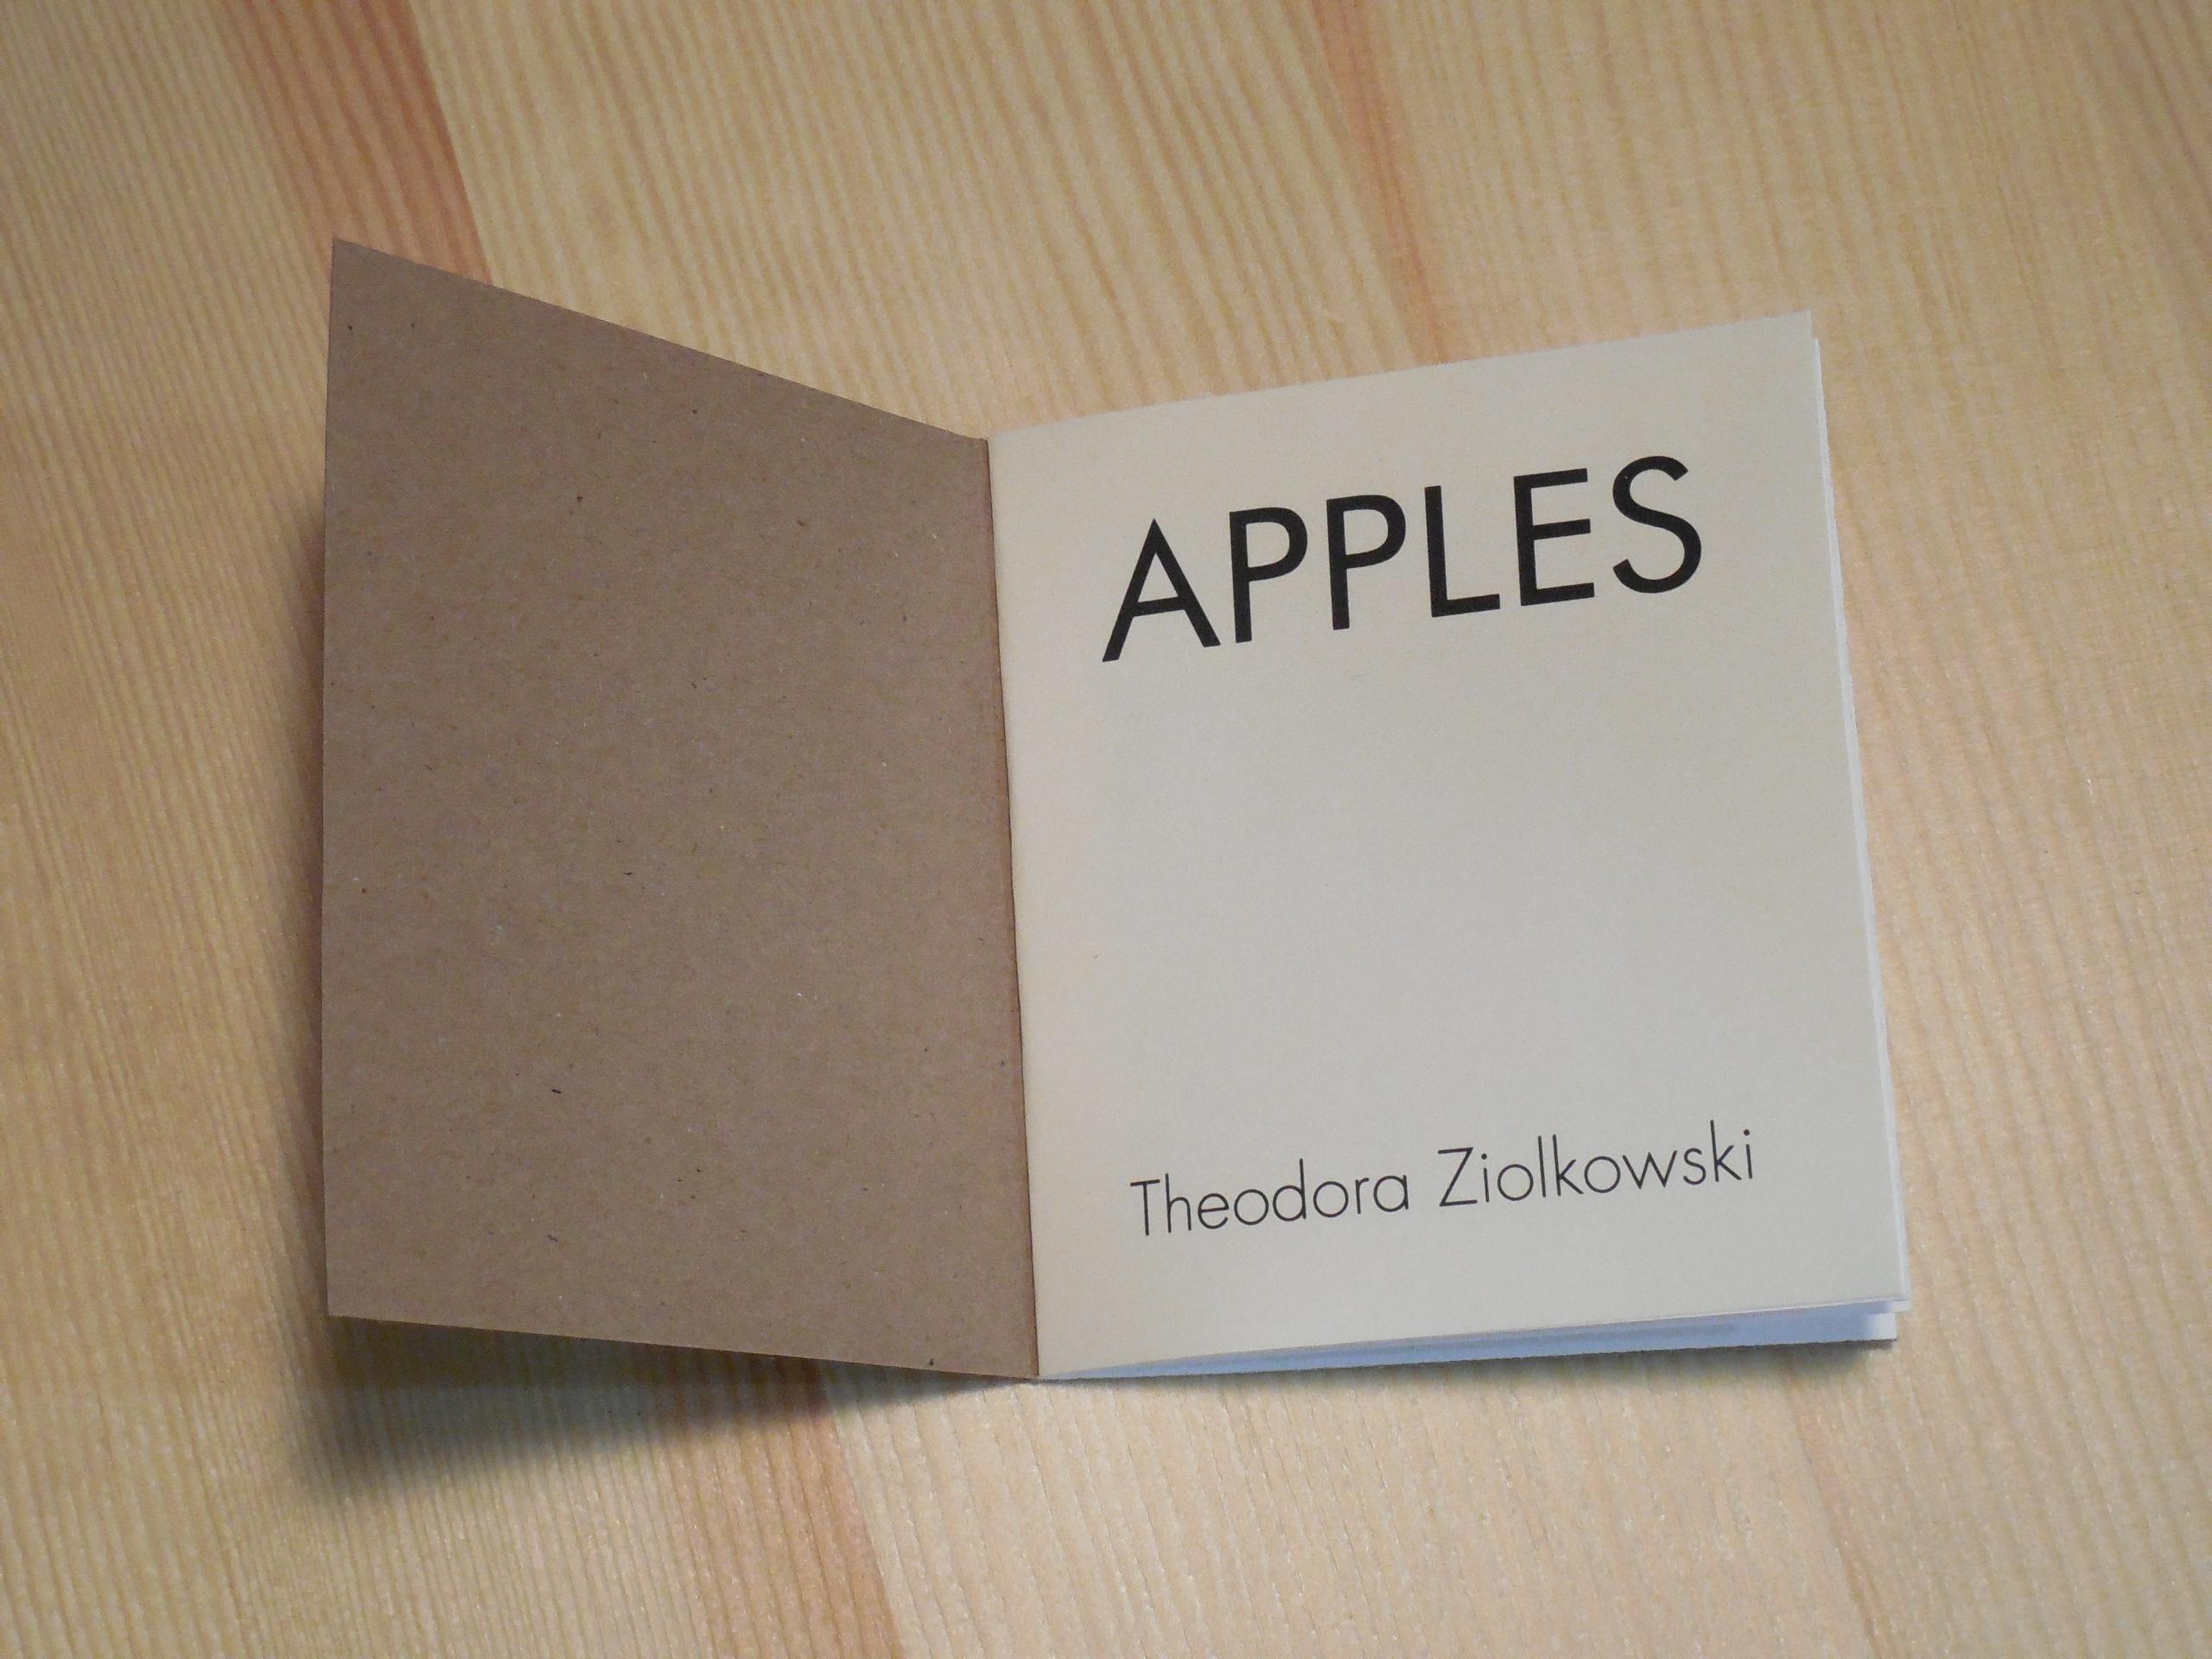 Apples CE 03